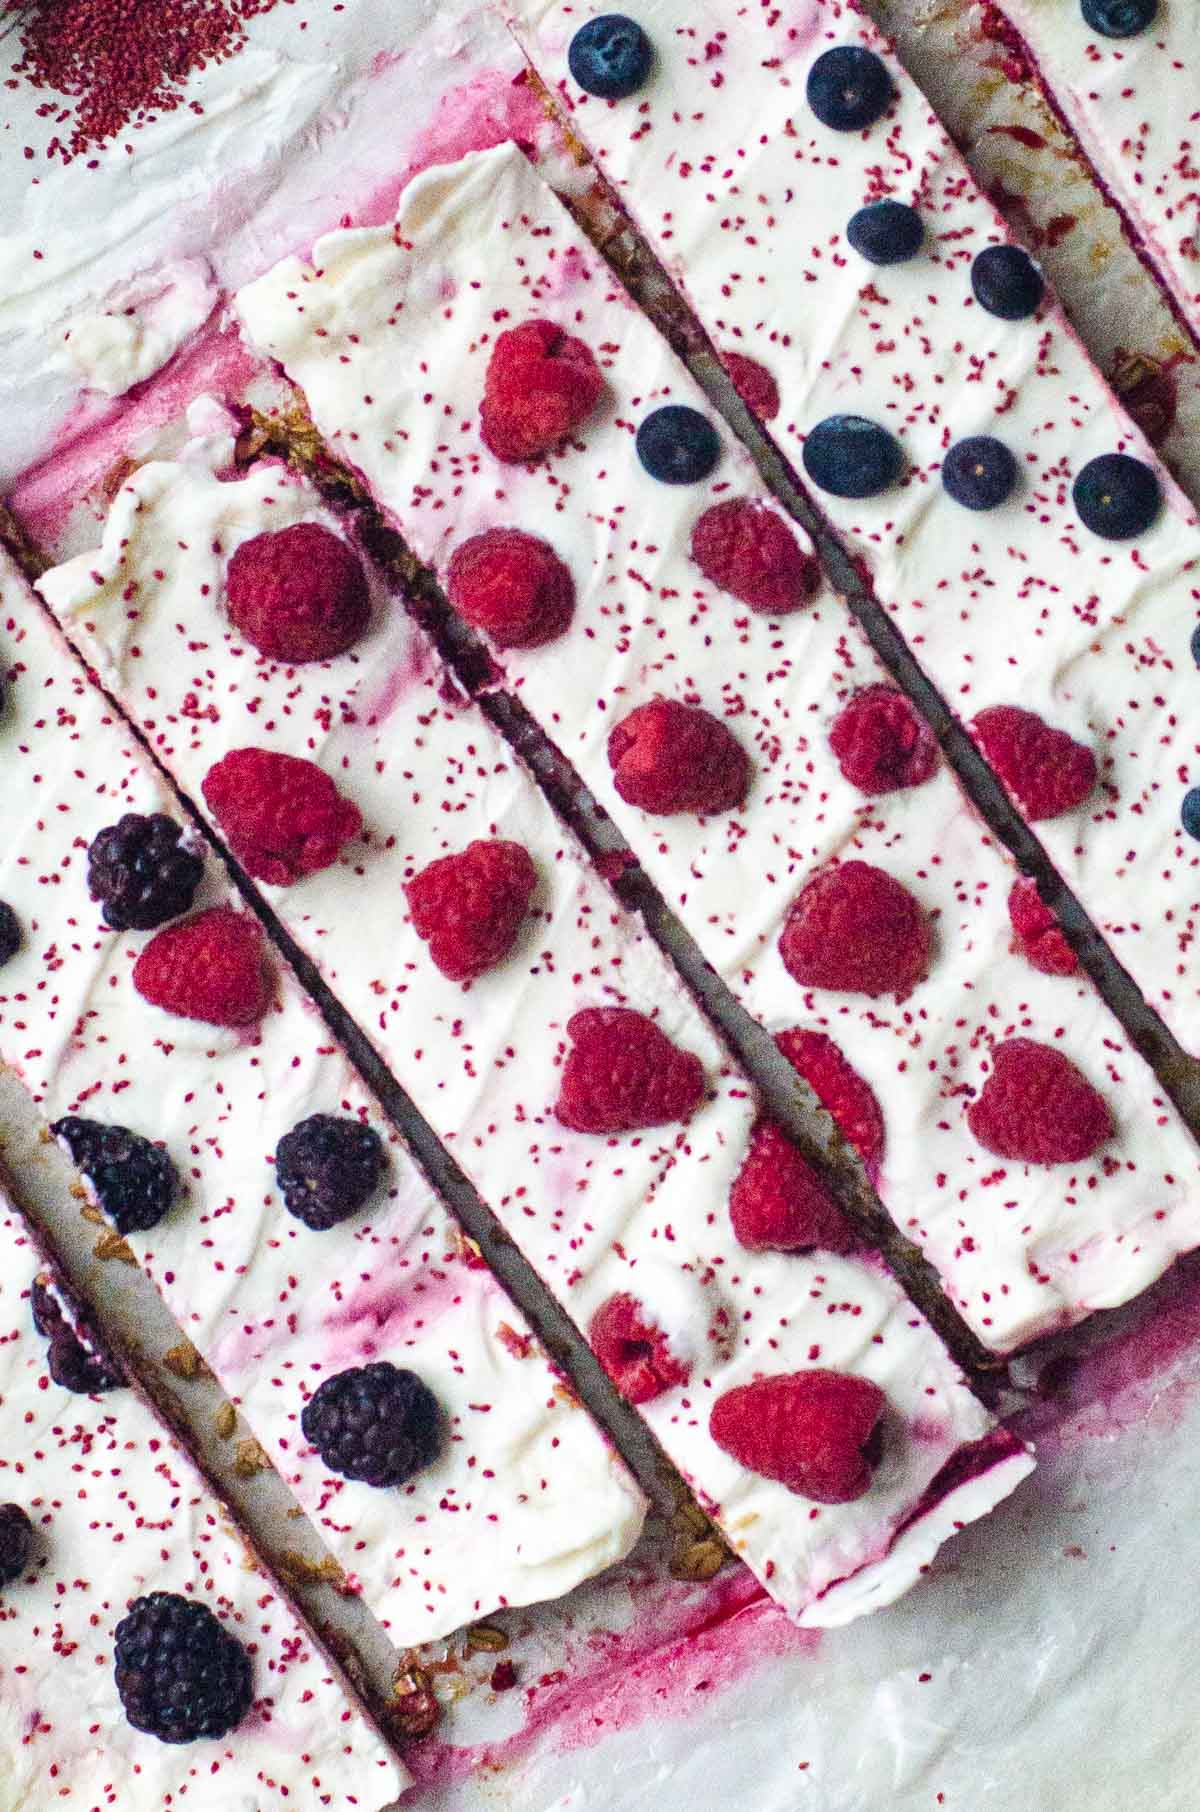 Overhead view of sliced frozen yogurt bars with fresh berries on top.